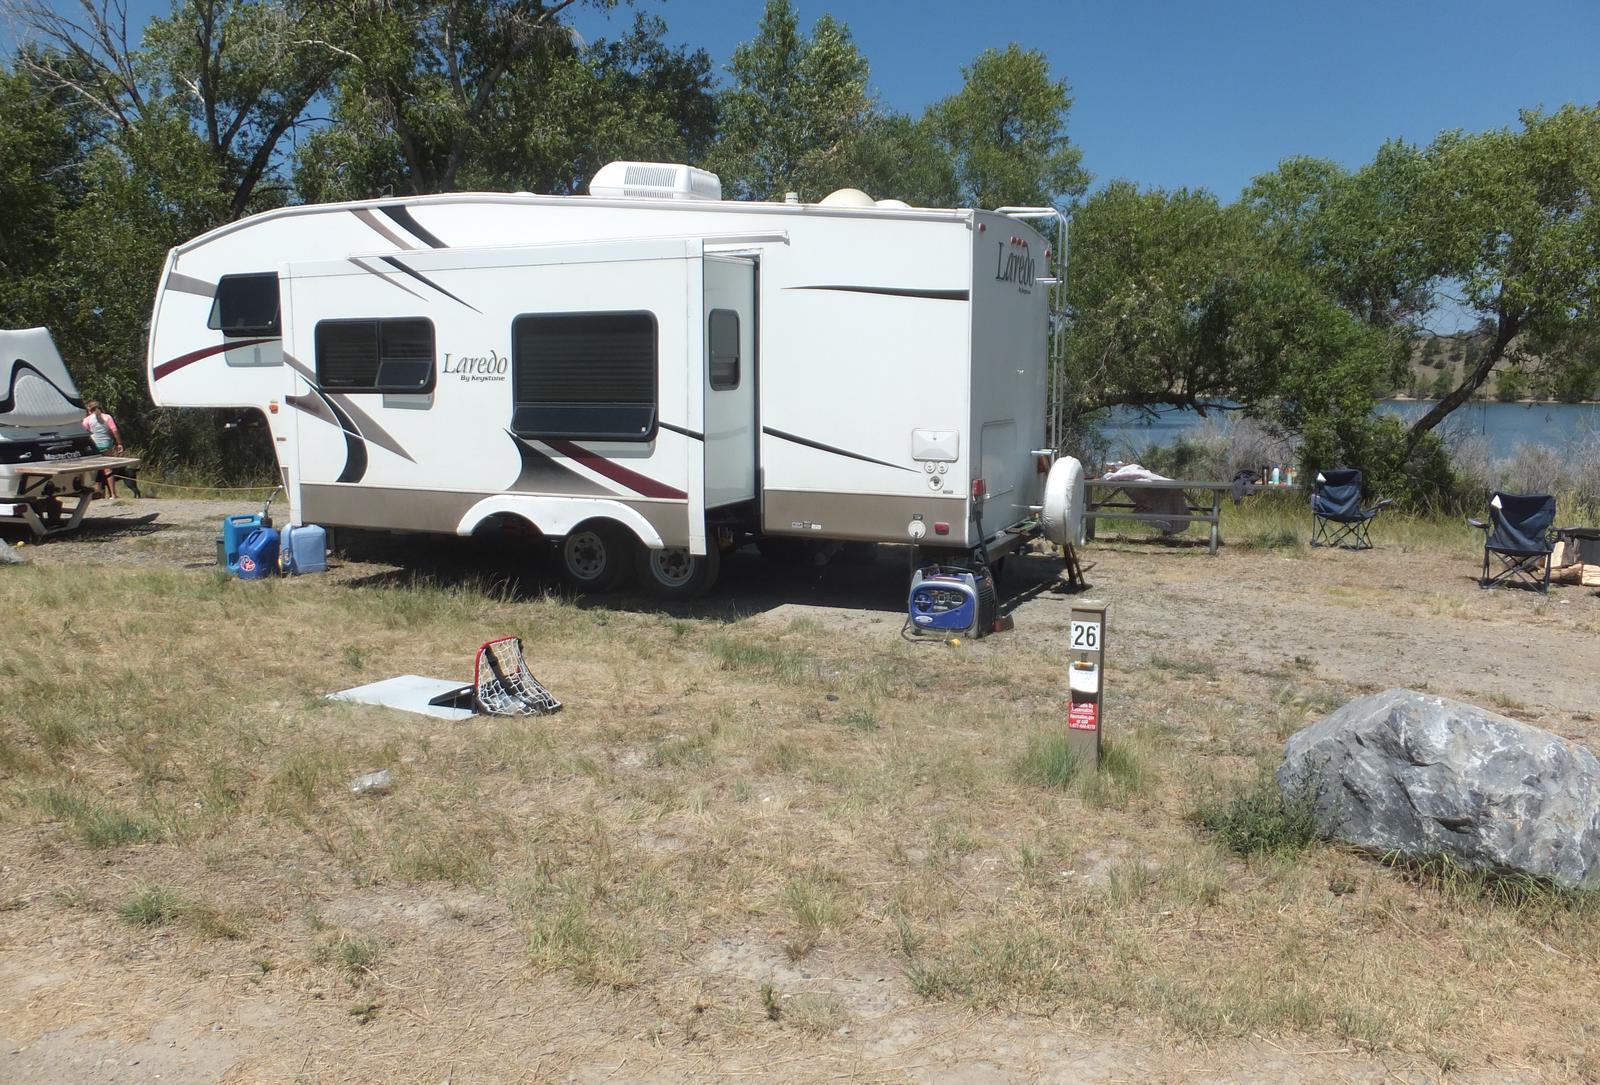 Hellgate Campground - Campsite 26